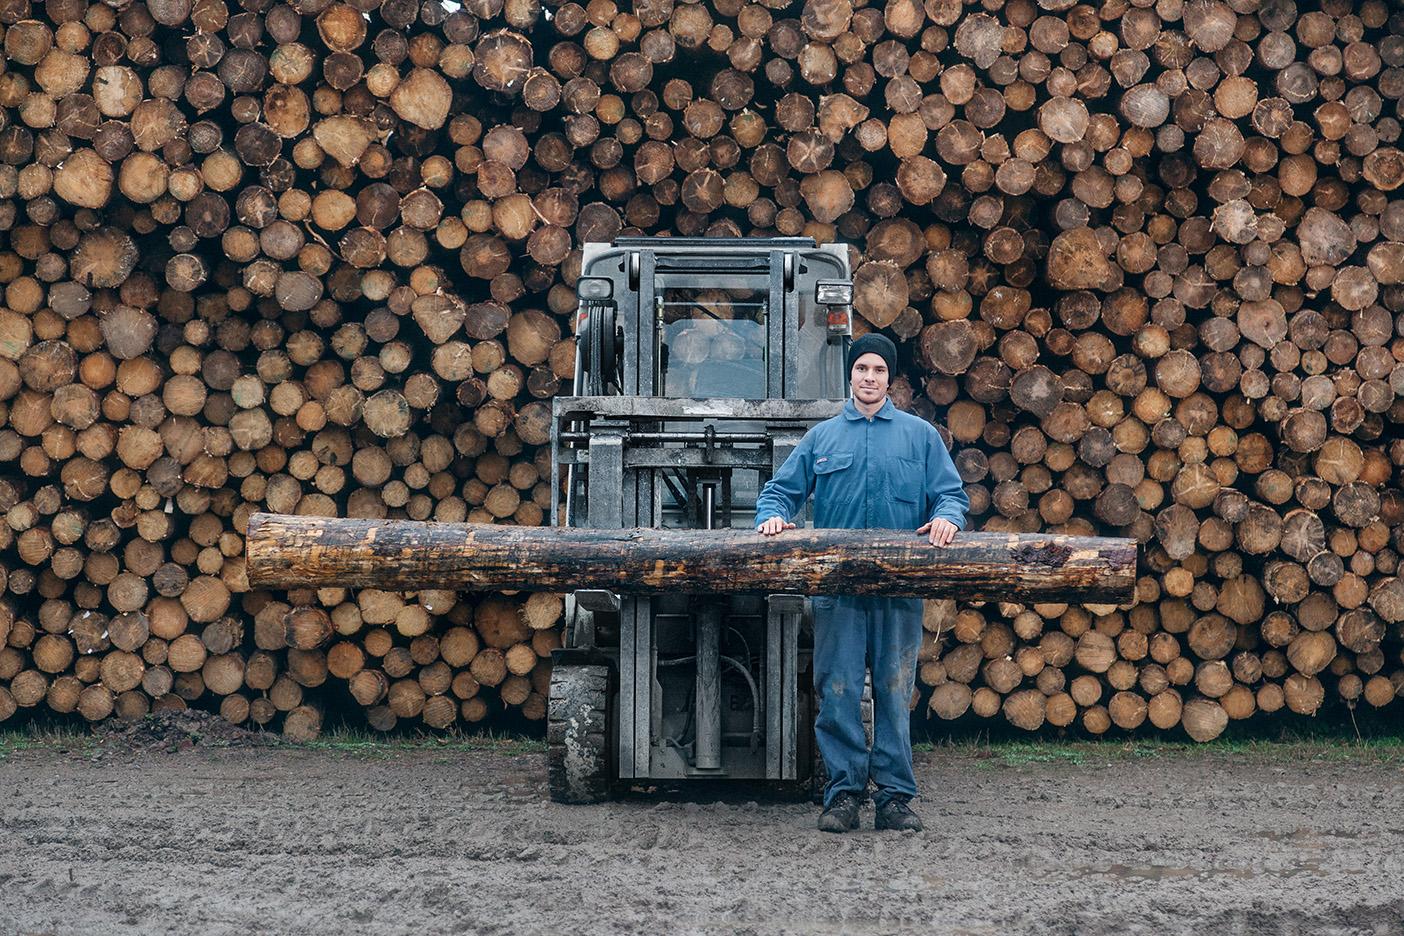 Panel - Factory Worker